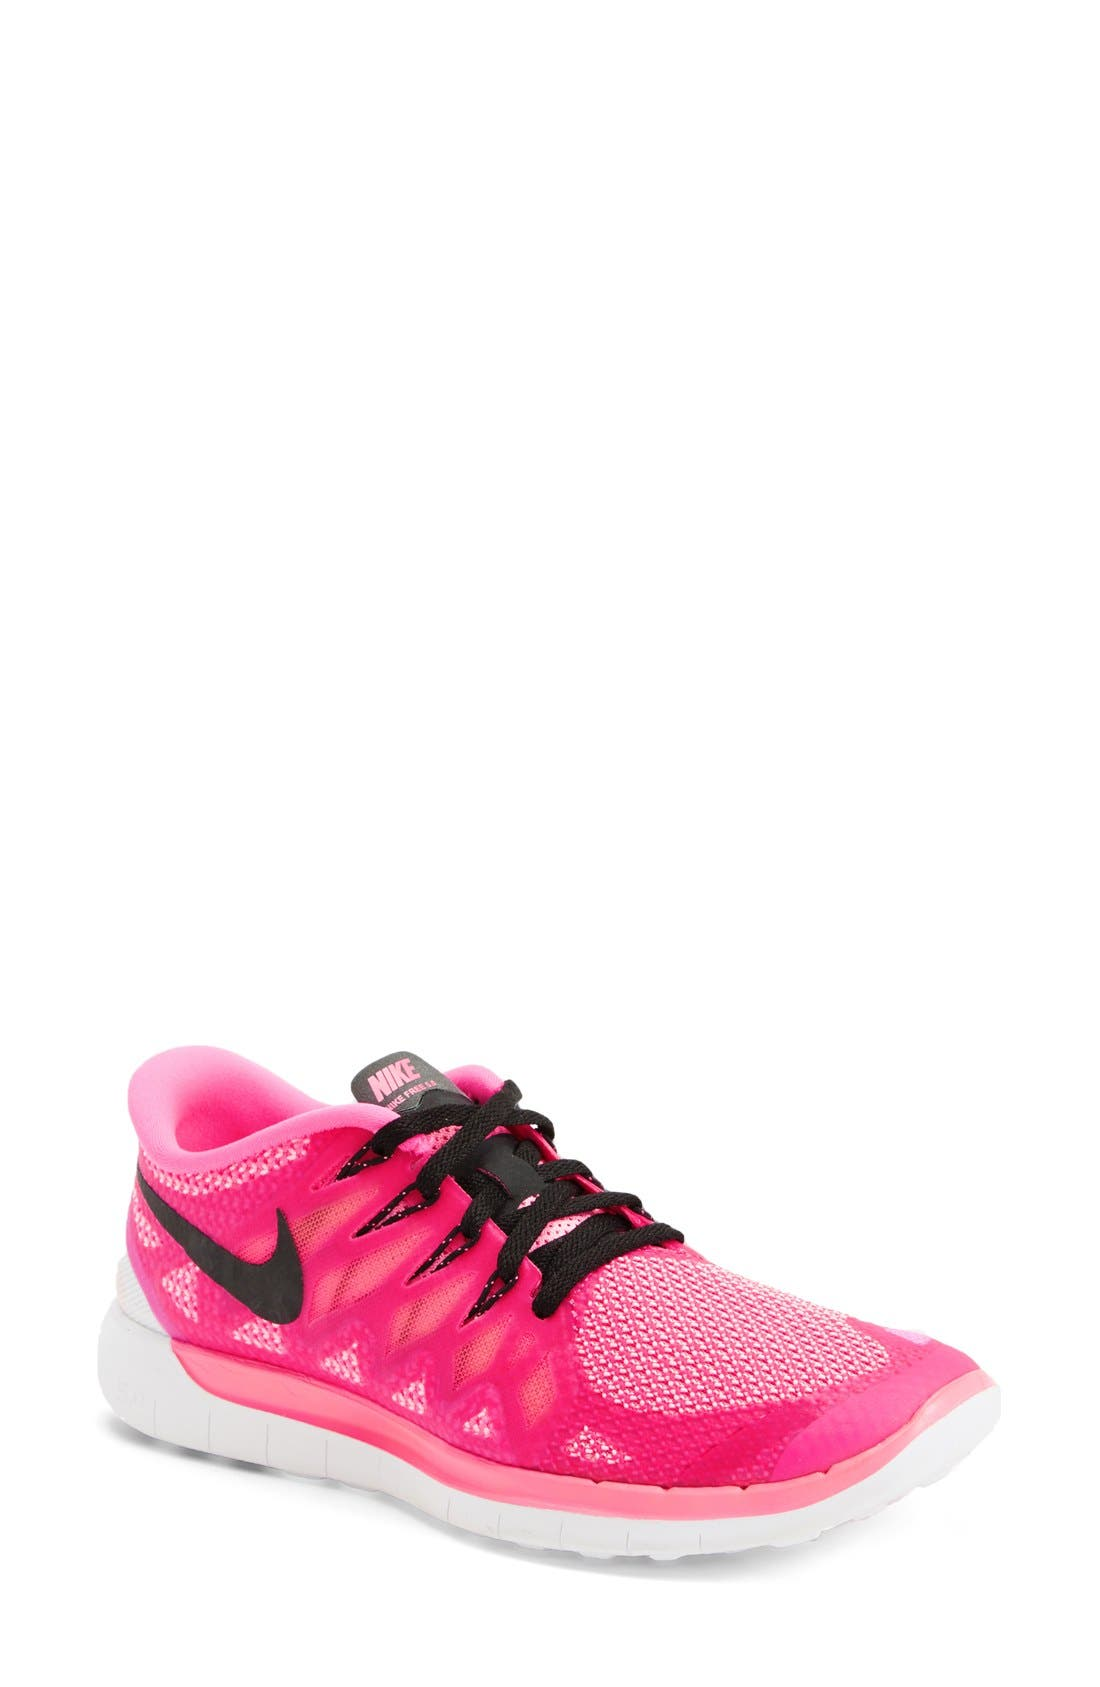 Main Image - Nike 'Free 5.0 14' Running Shoe (Women)